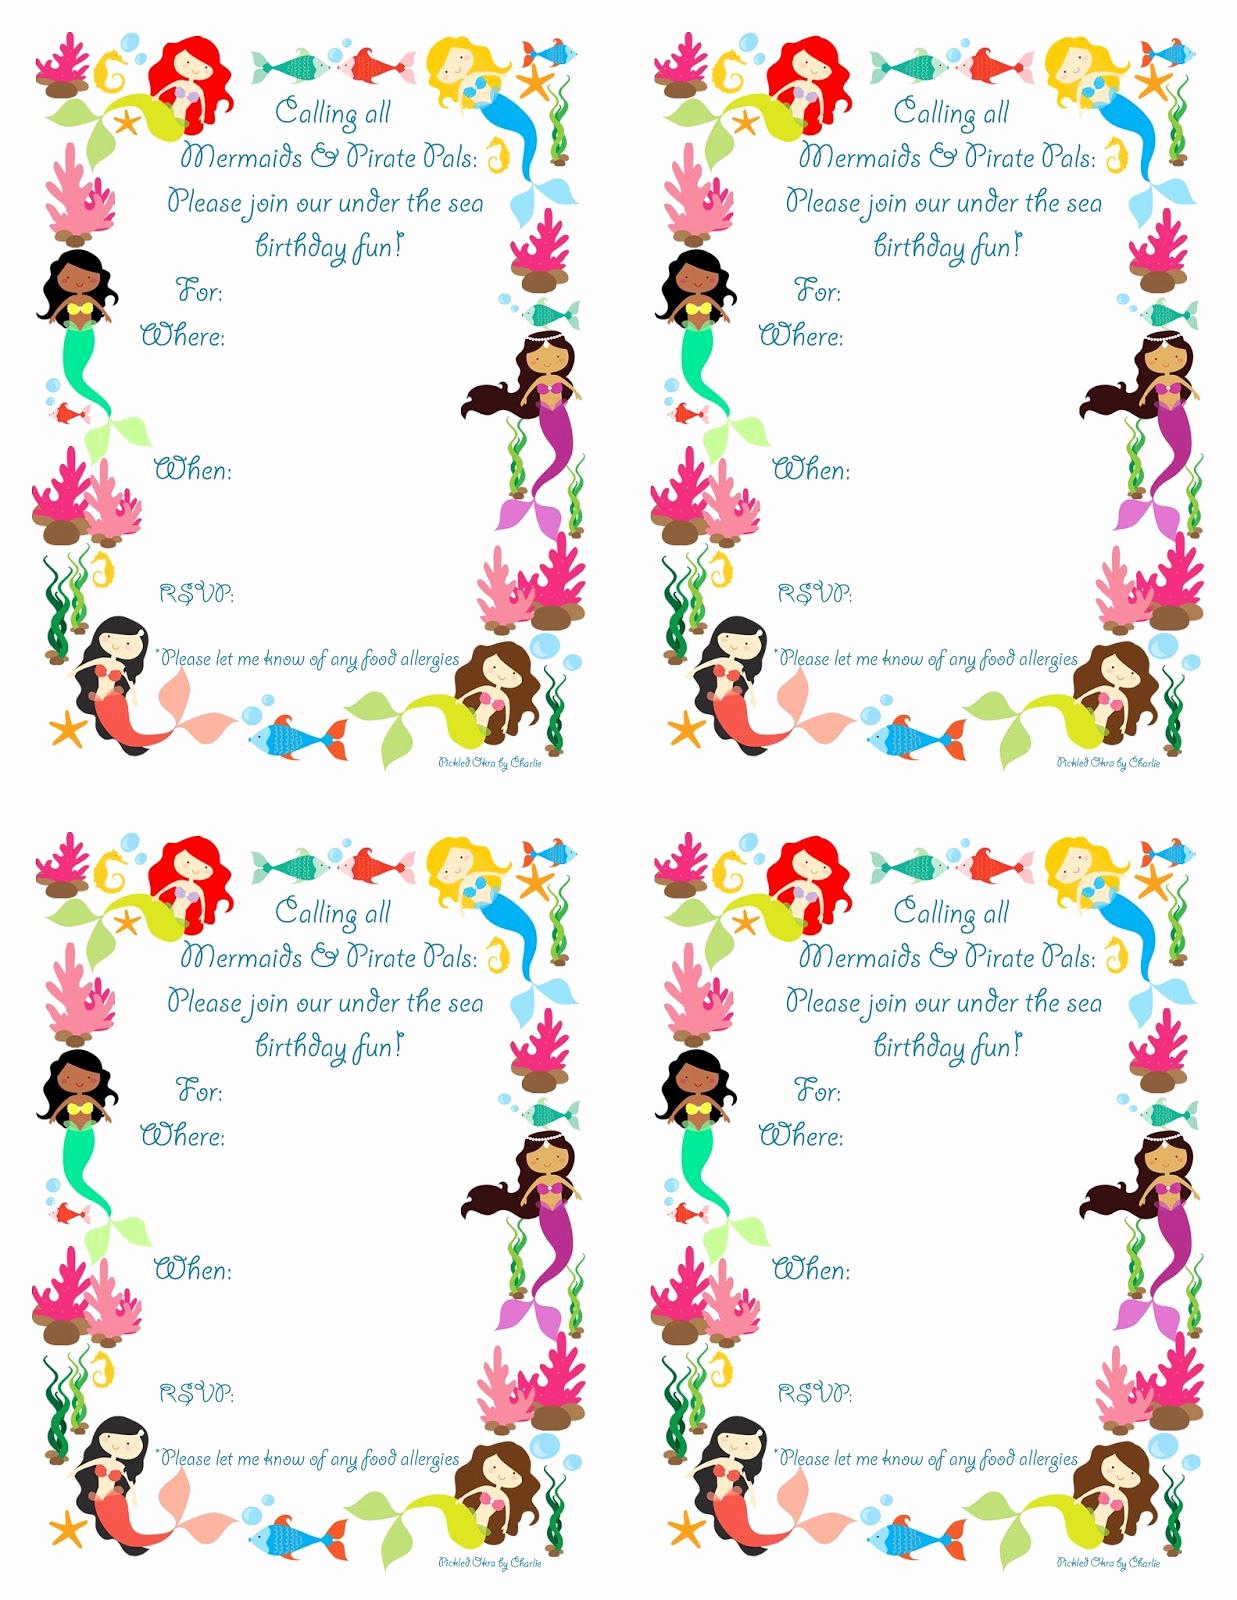 Mermaid Birthday Invitation Templates Beautiful Mermaid Bithday Party Invitations Free Printable